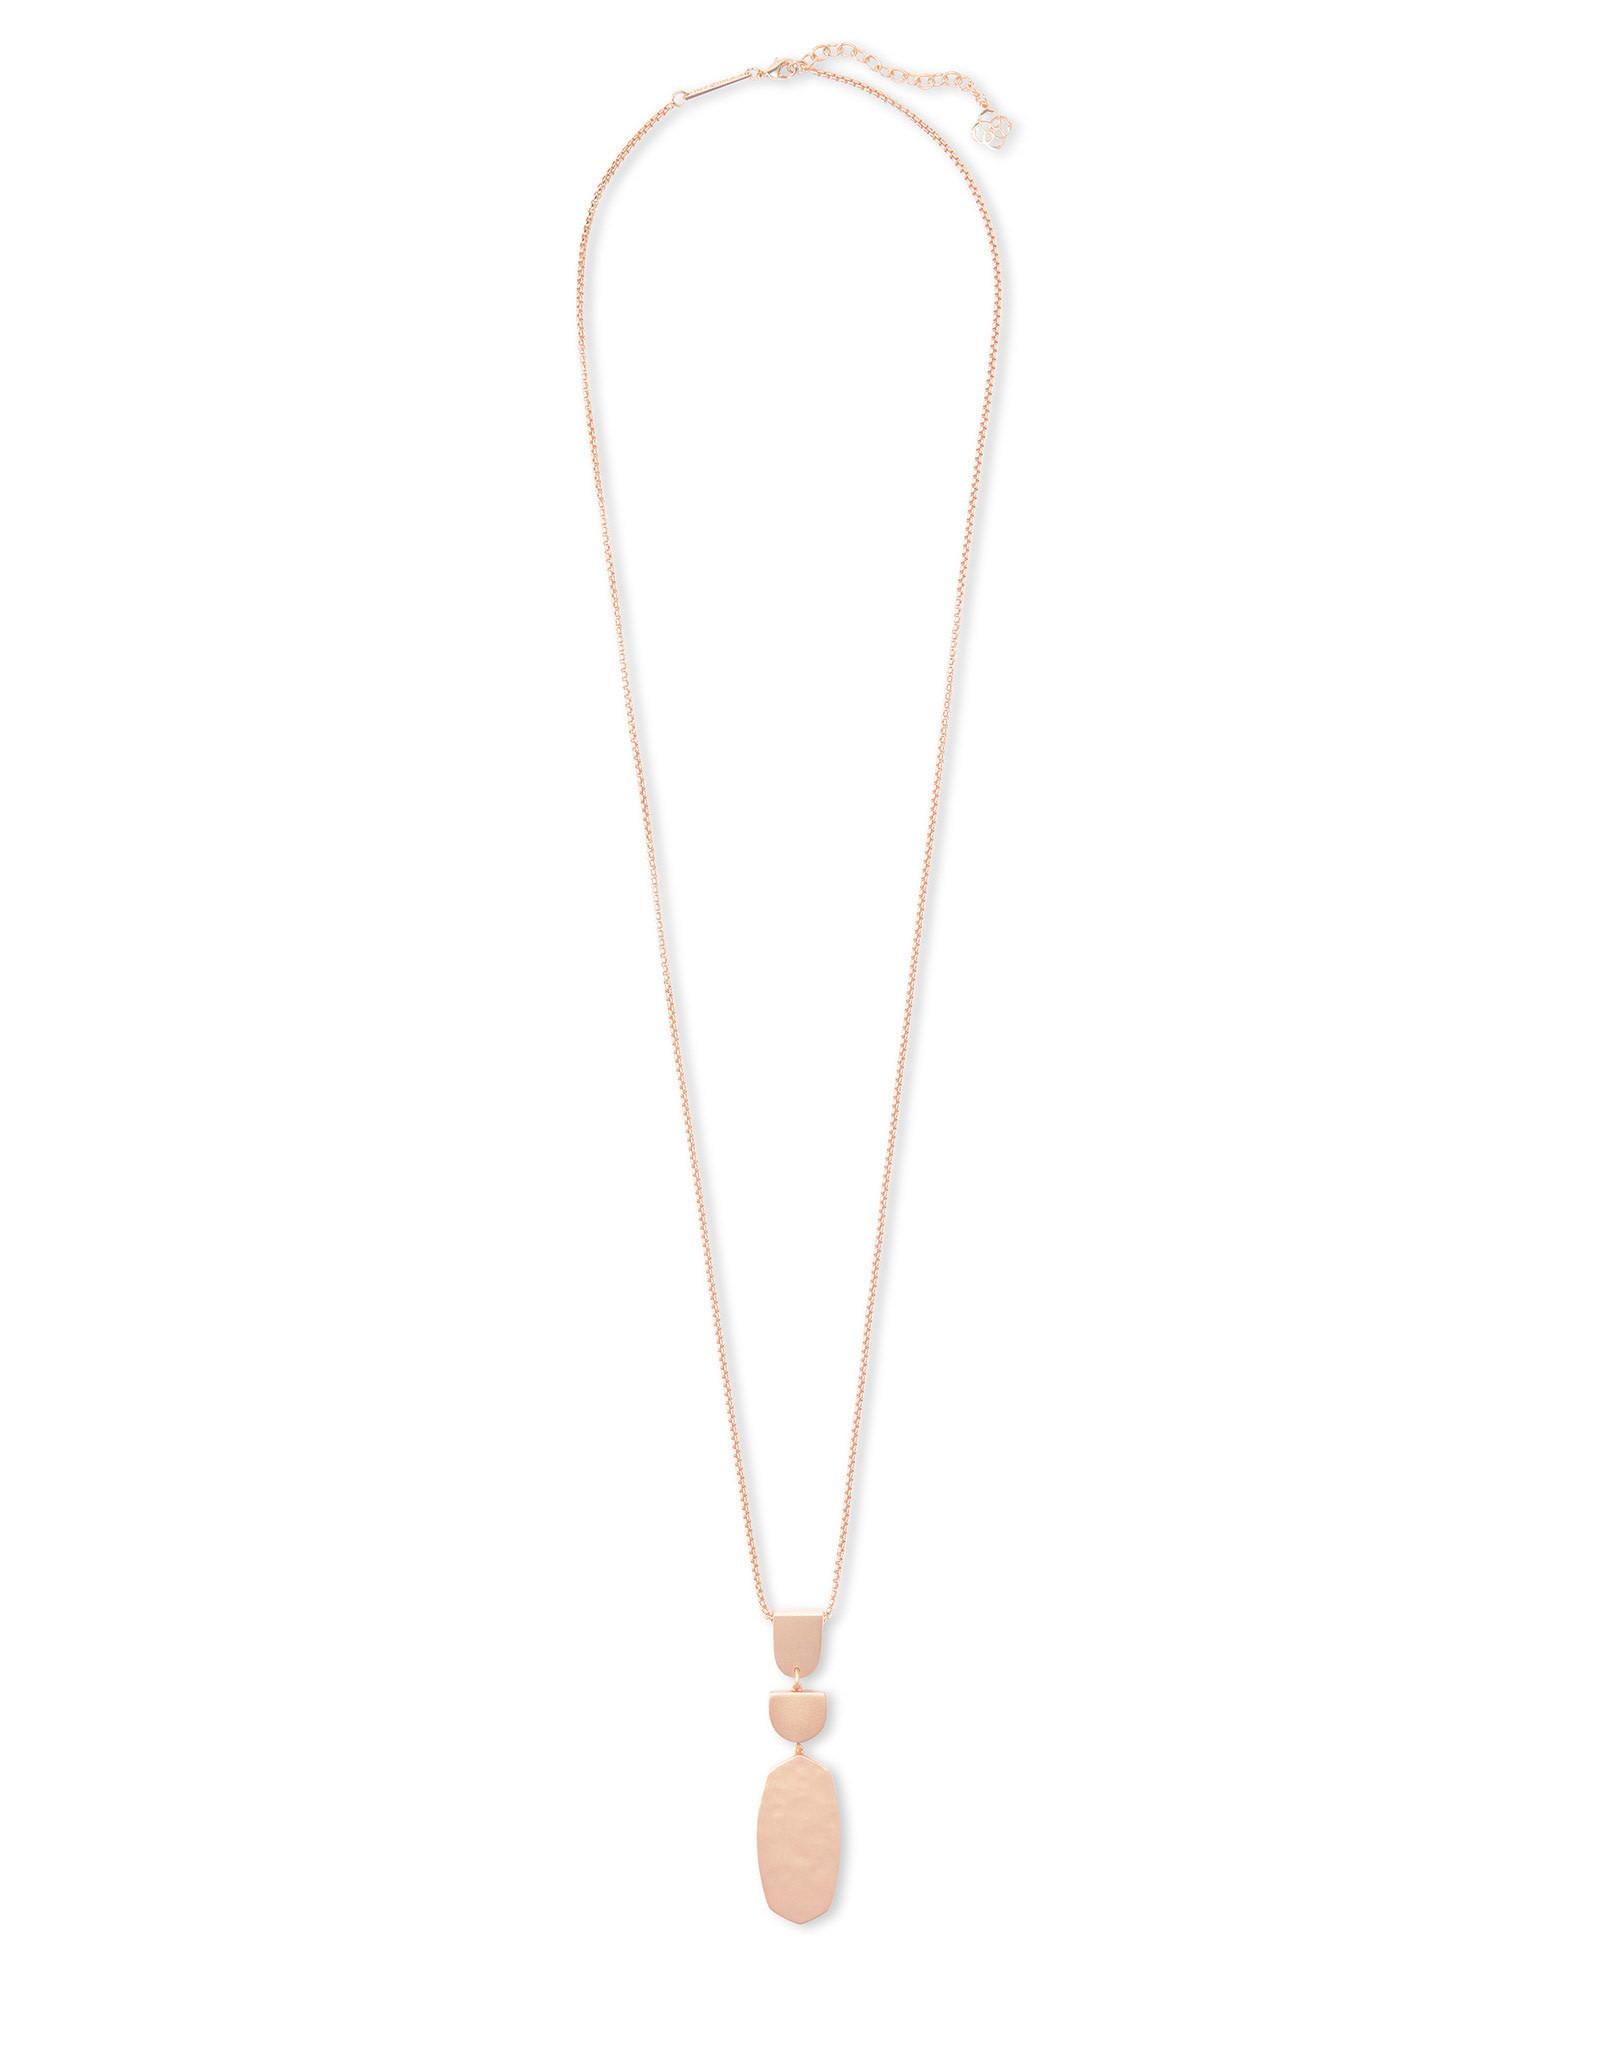 Kendra Scott Noah Long Pendant Necklace in Rose Gold